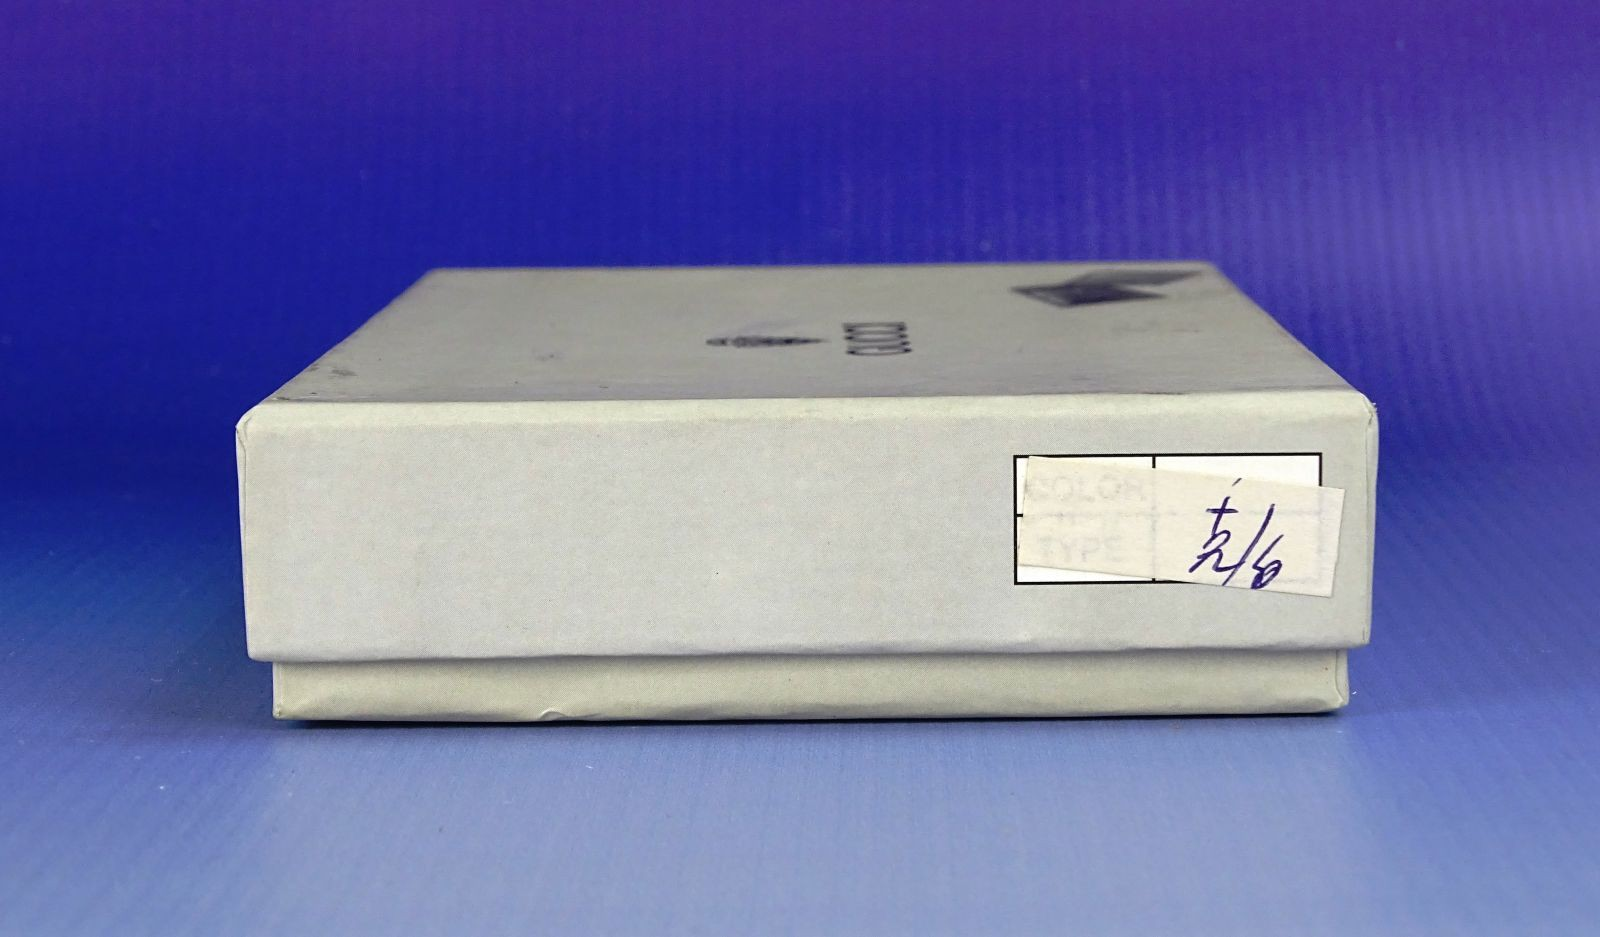 DSC05298.JPG (1600�937)